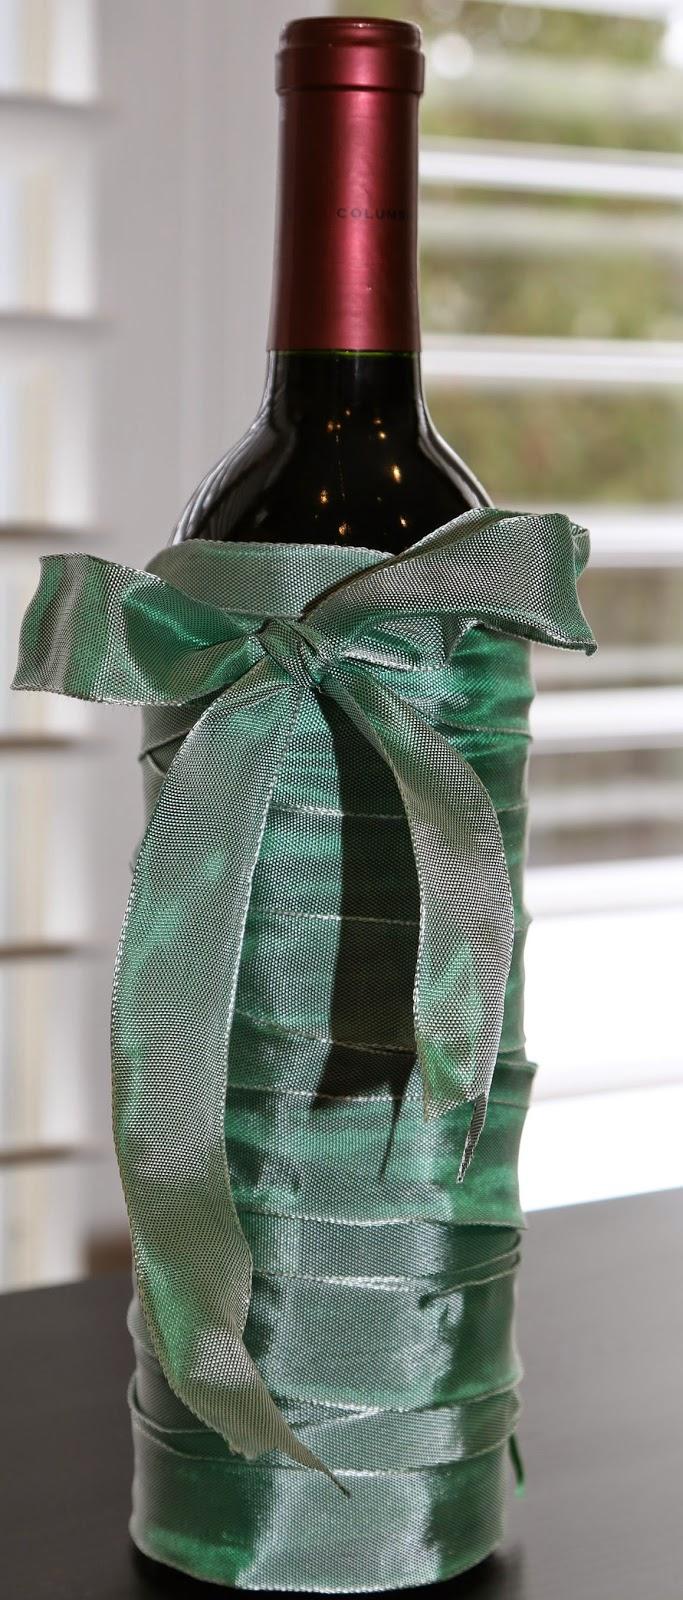 Ribbon Wine Bottle Wrapping Image